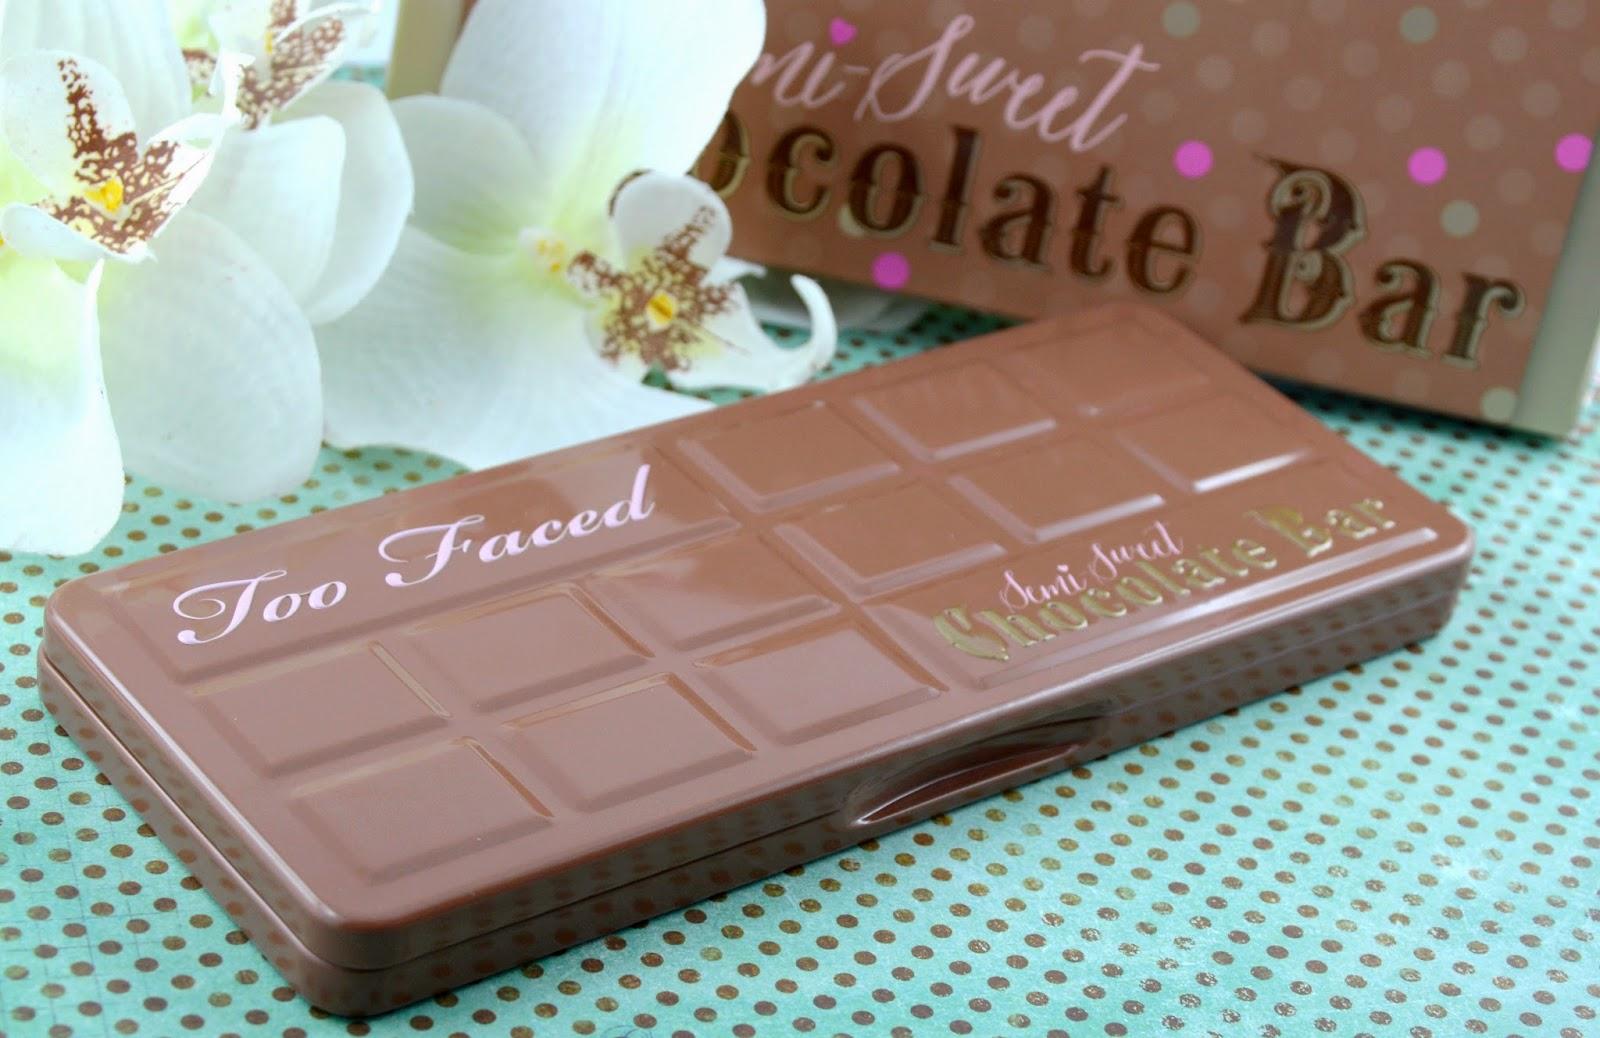 La palette gourmande Semi -Sweet Chocolate Bar de Too Faced